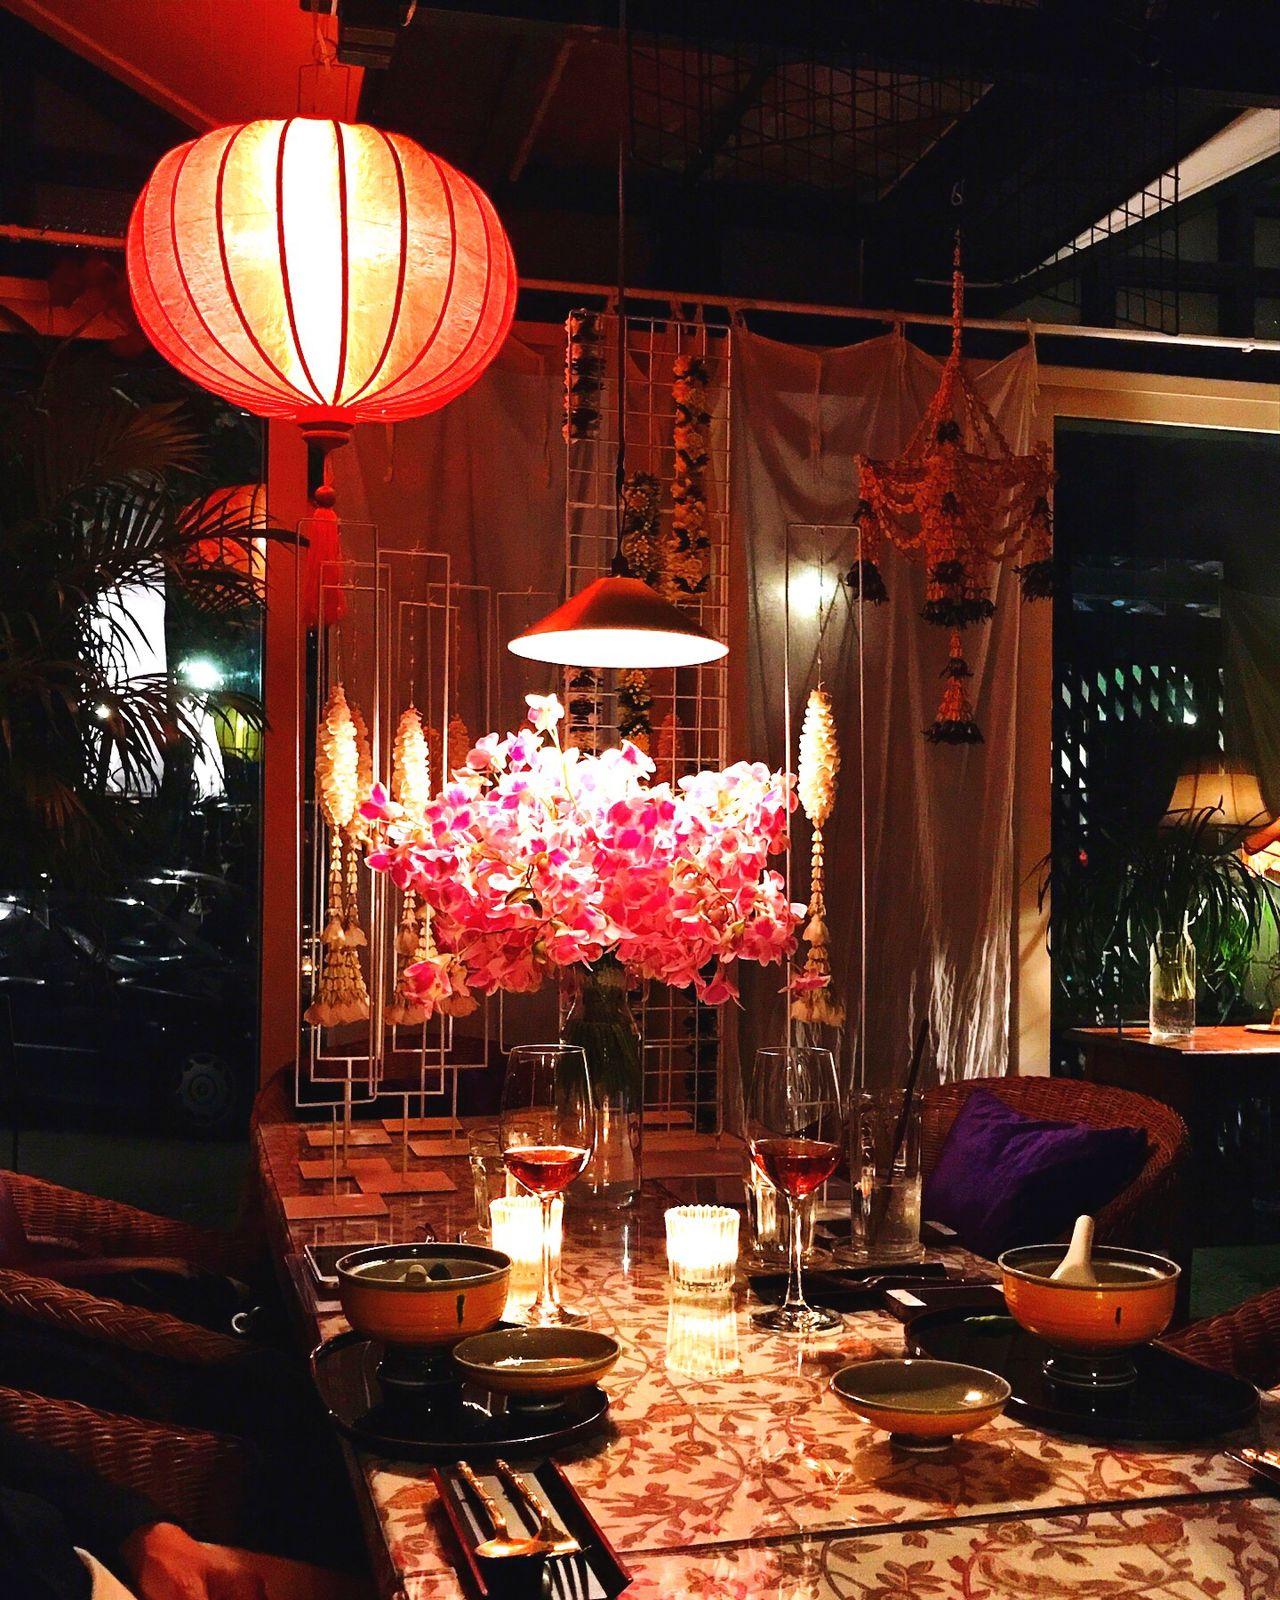 Dinner Table Lantern Hanging Lighting Equipment Illuminated Chair No People Indoors  Night Architecture Dinner Restaurant